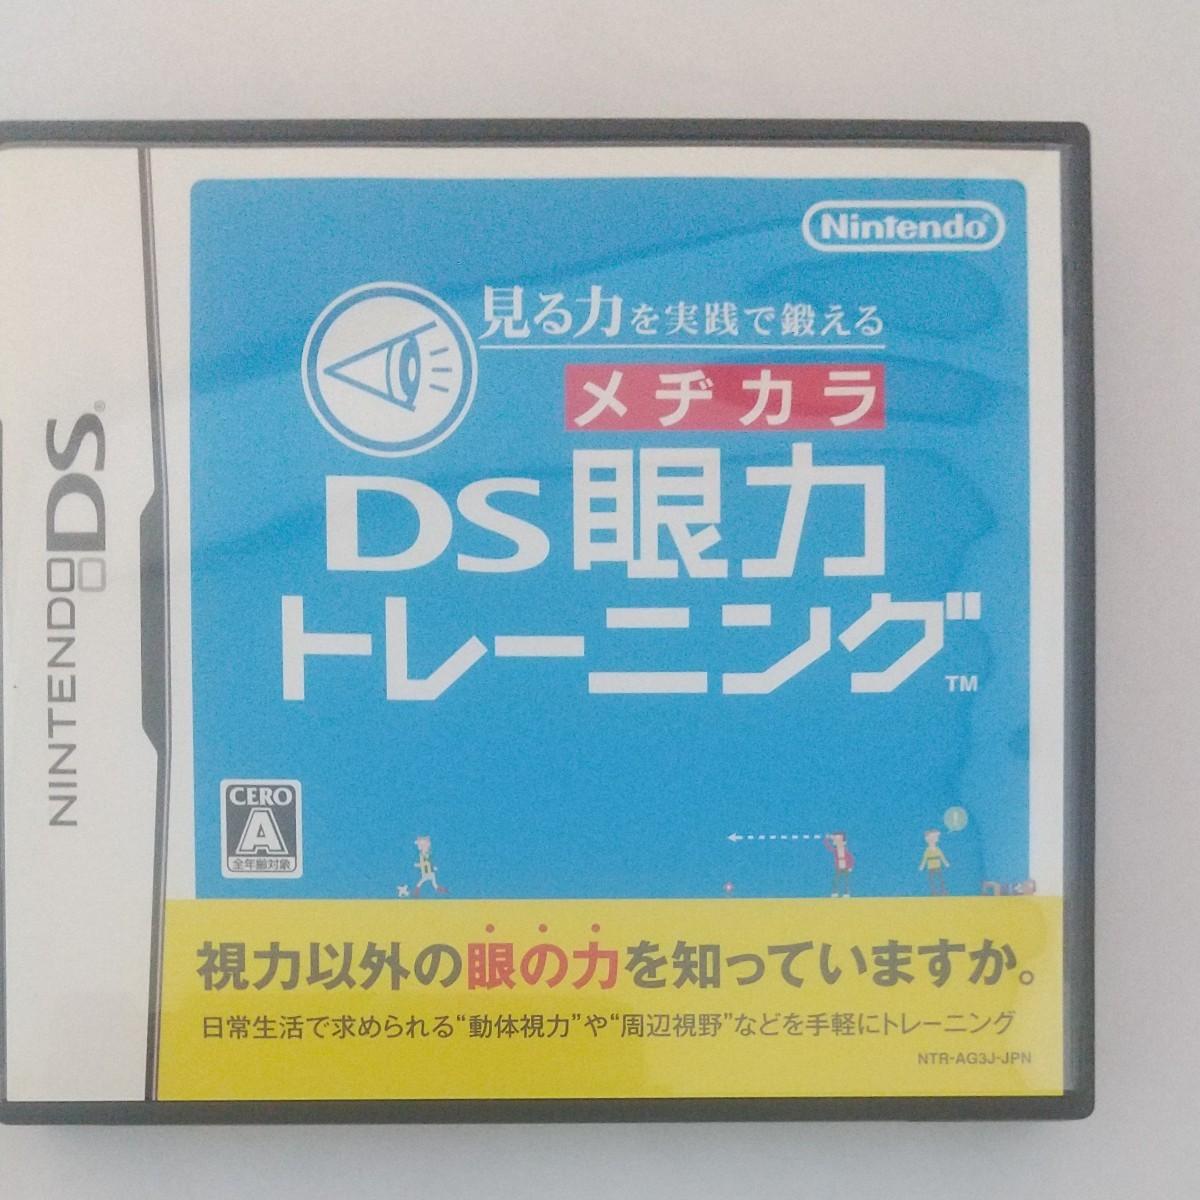 DSソフト DS眼力トレーニング ニンテンドーDS